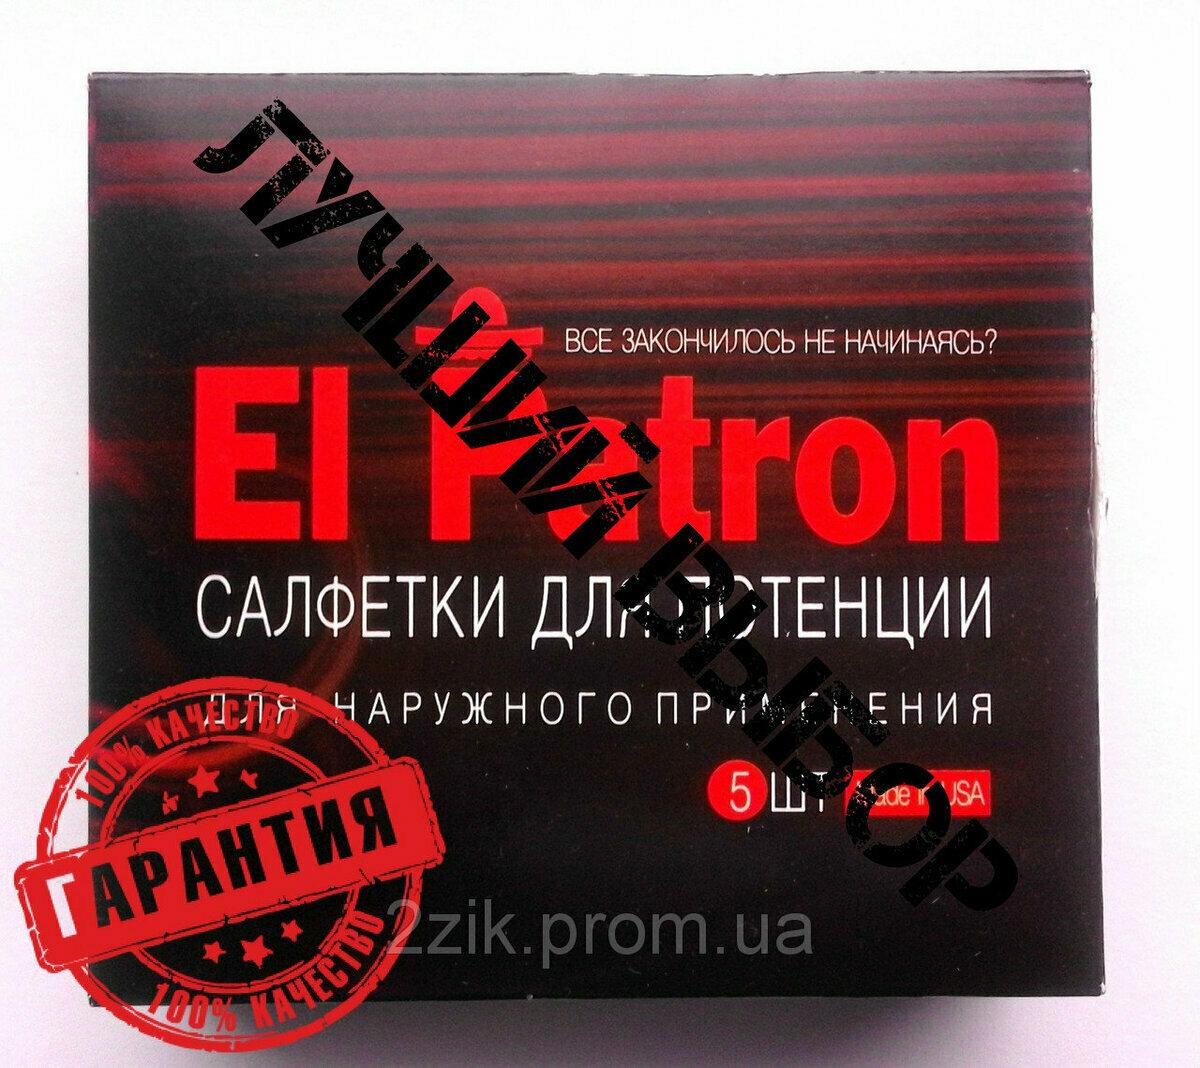 El Patron - салфетки для потенции в Костроме